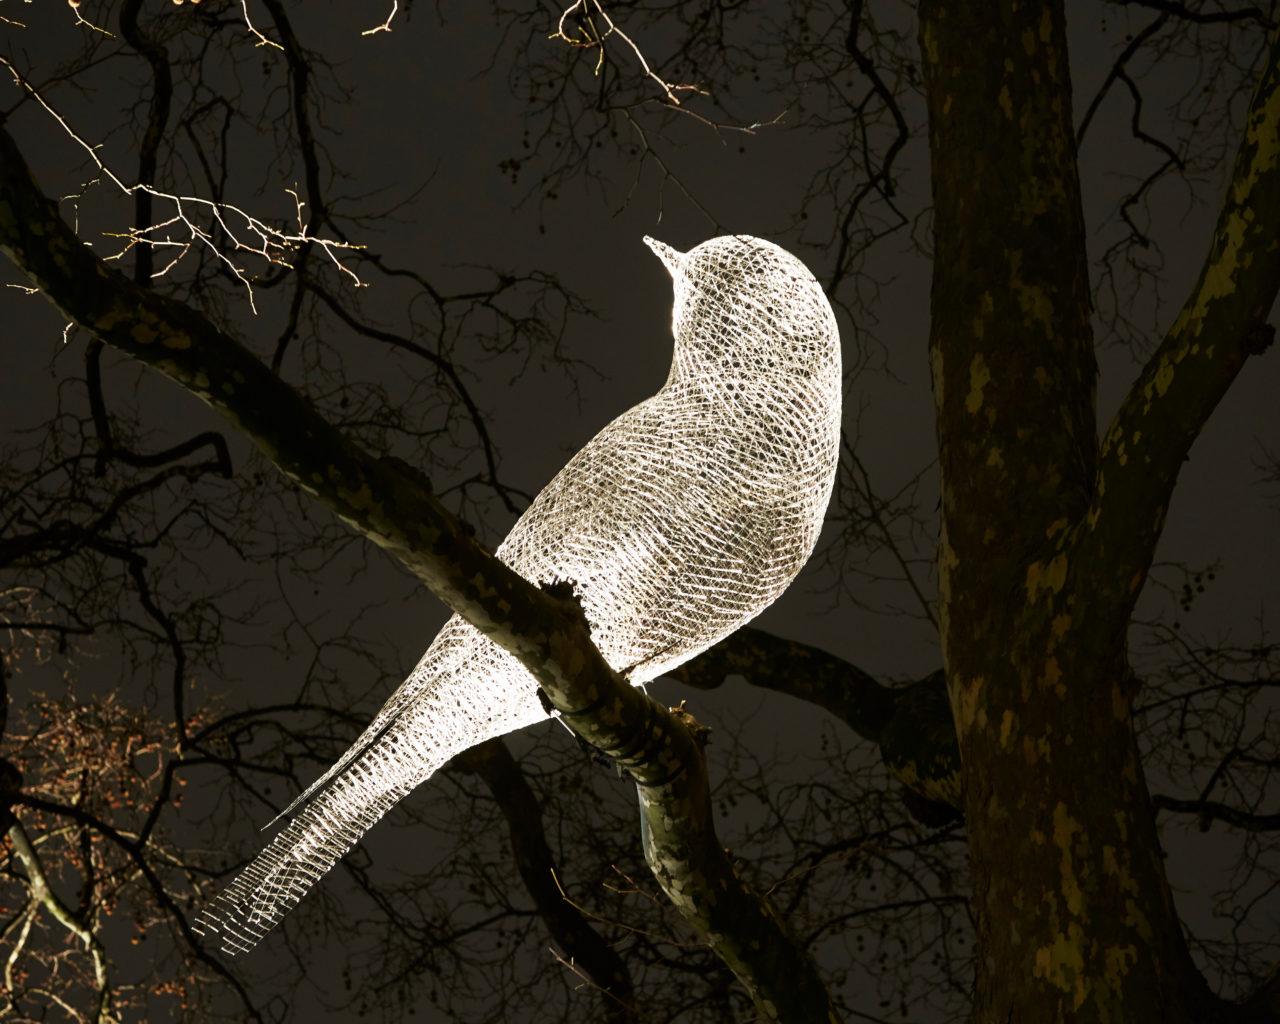 Was That a Dream? by Cédric Le Borgne, Berkeley Square, Mayfair. © MatthewAndrew